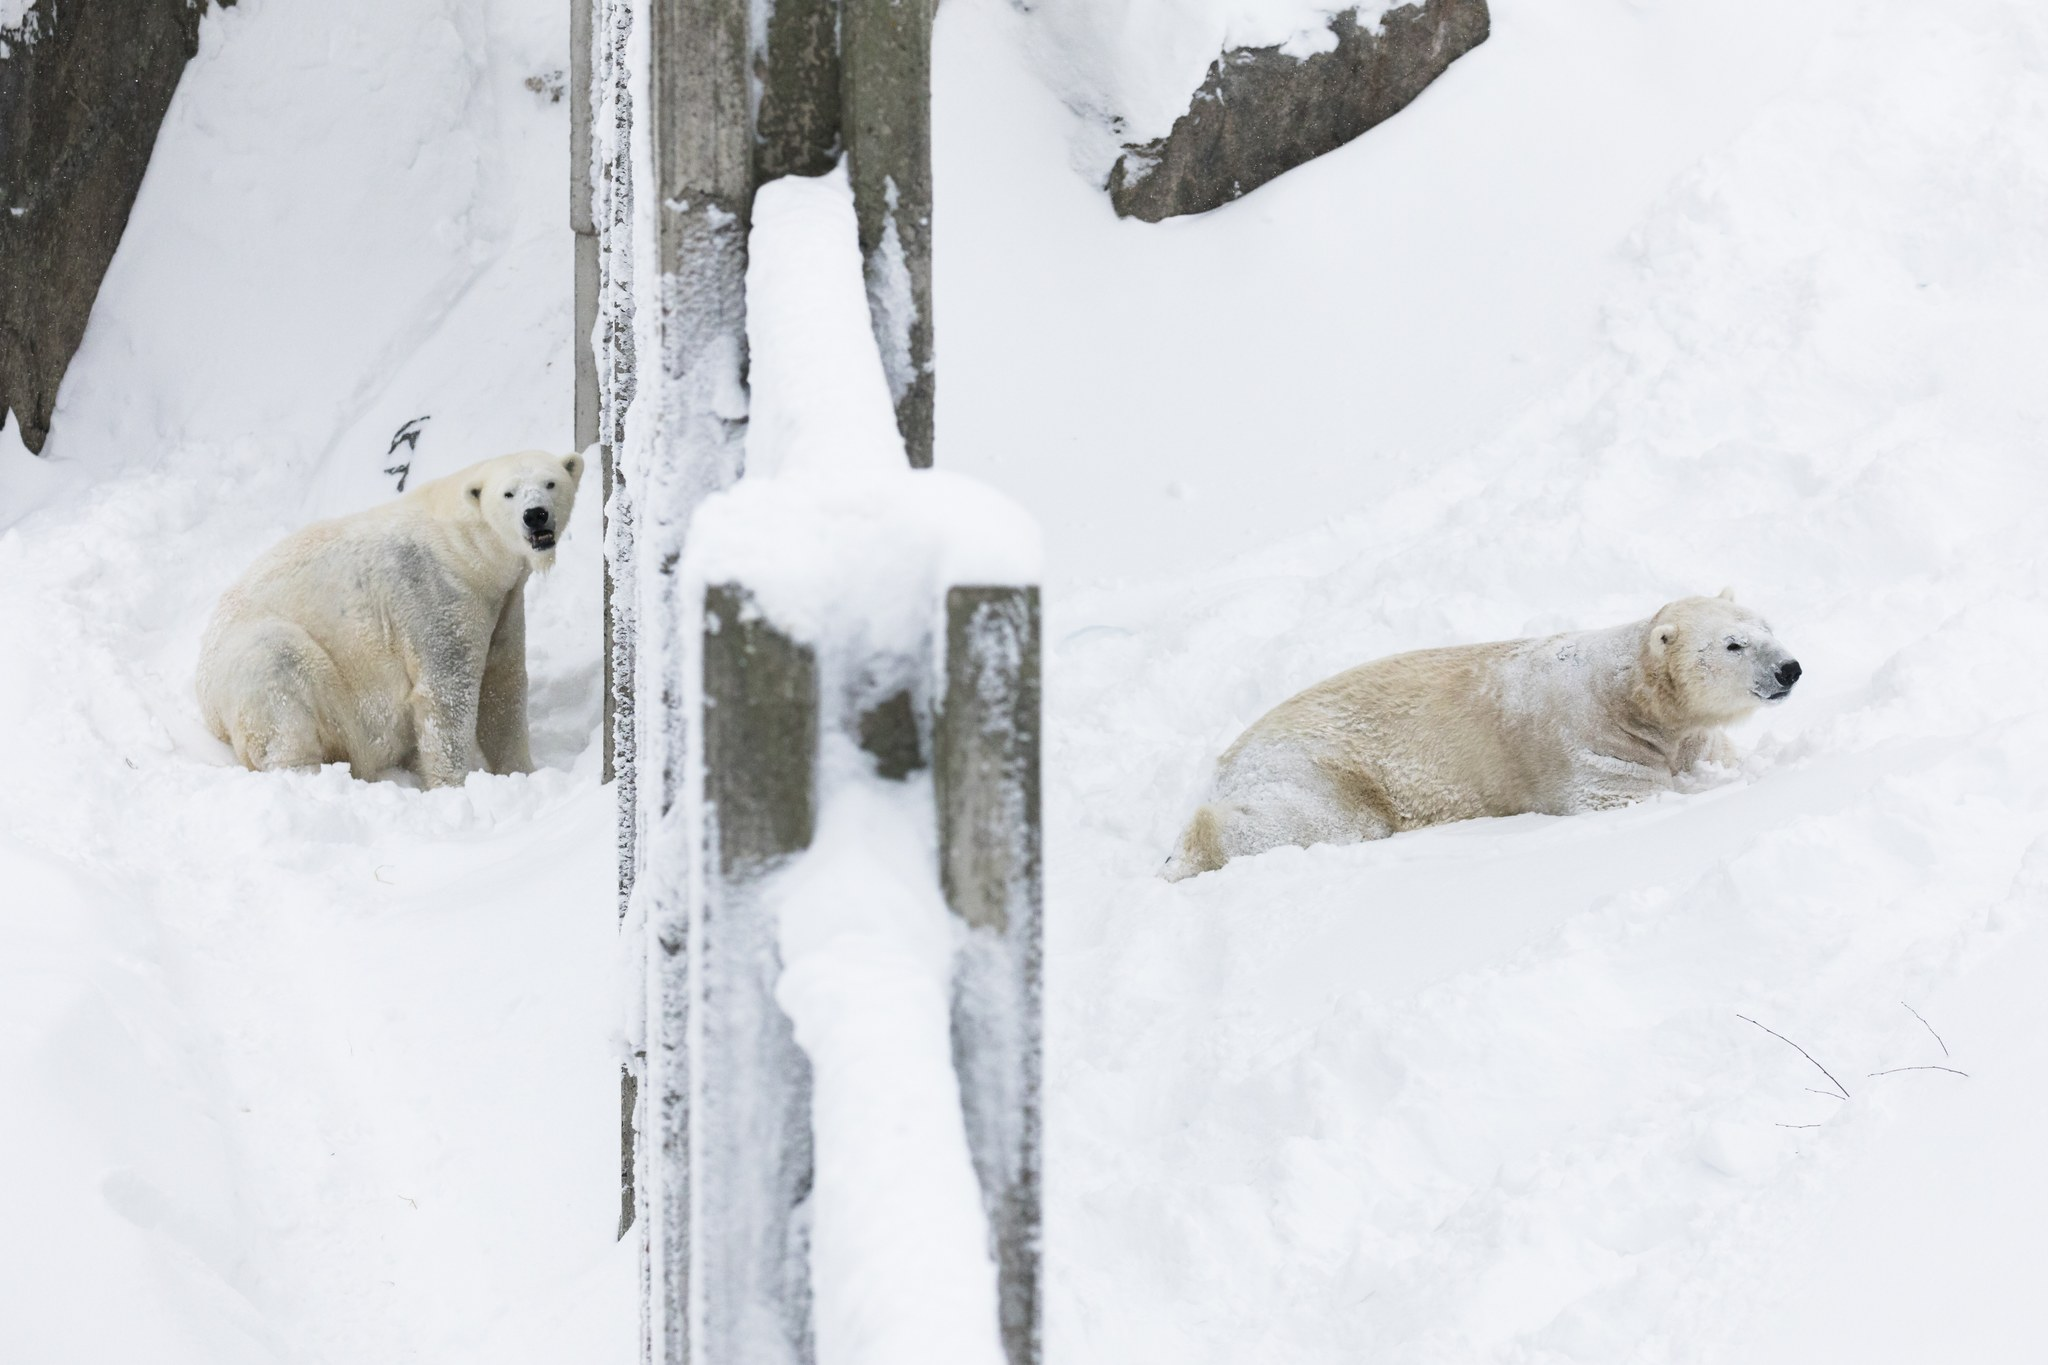 New Polarbear Nord in Ranua Zoo, Lapland, Finland. Photo Marko Junttila